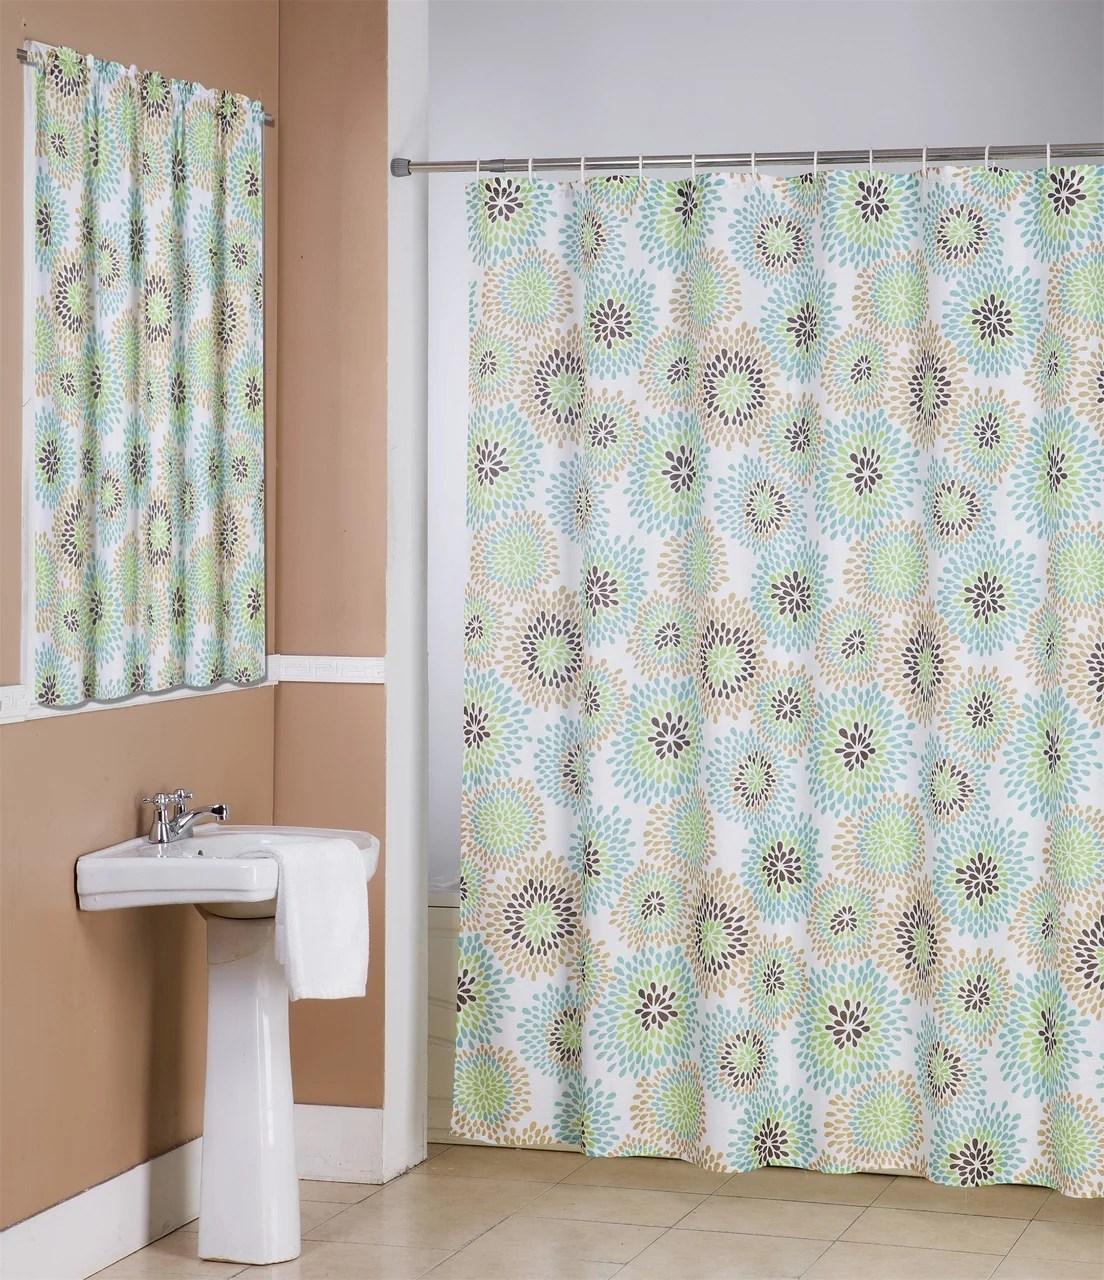 robin 14 piece bathroom accessories set canvas shower curtain hooks bathroom window curtain